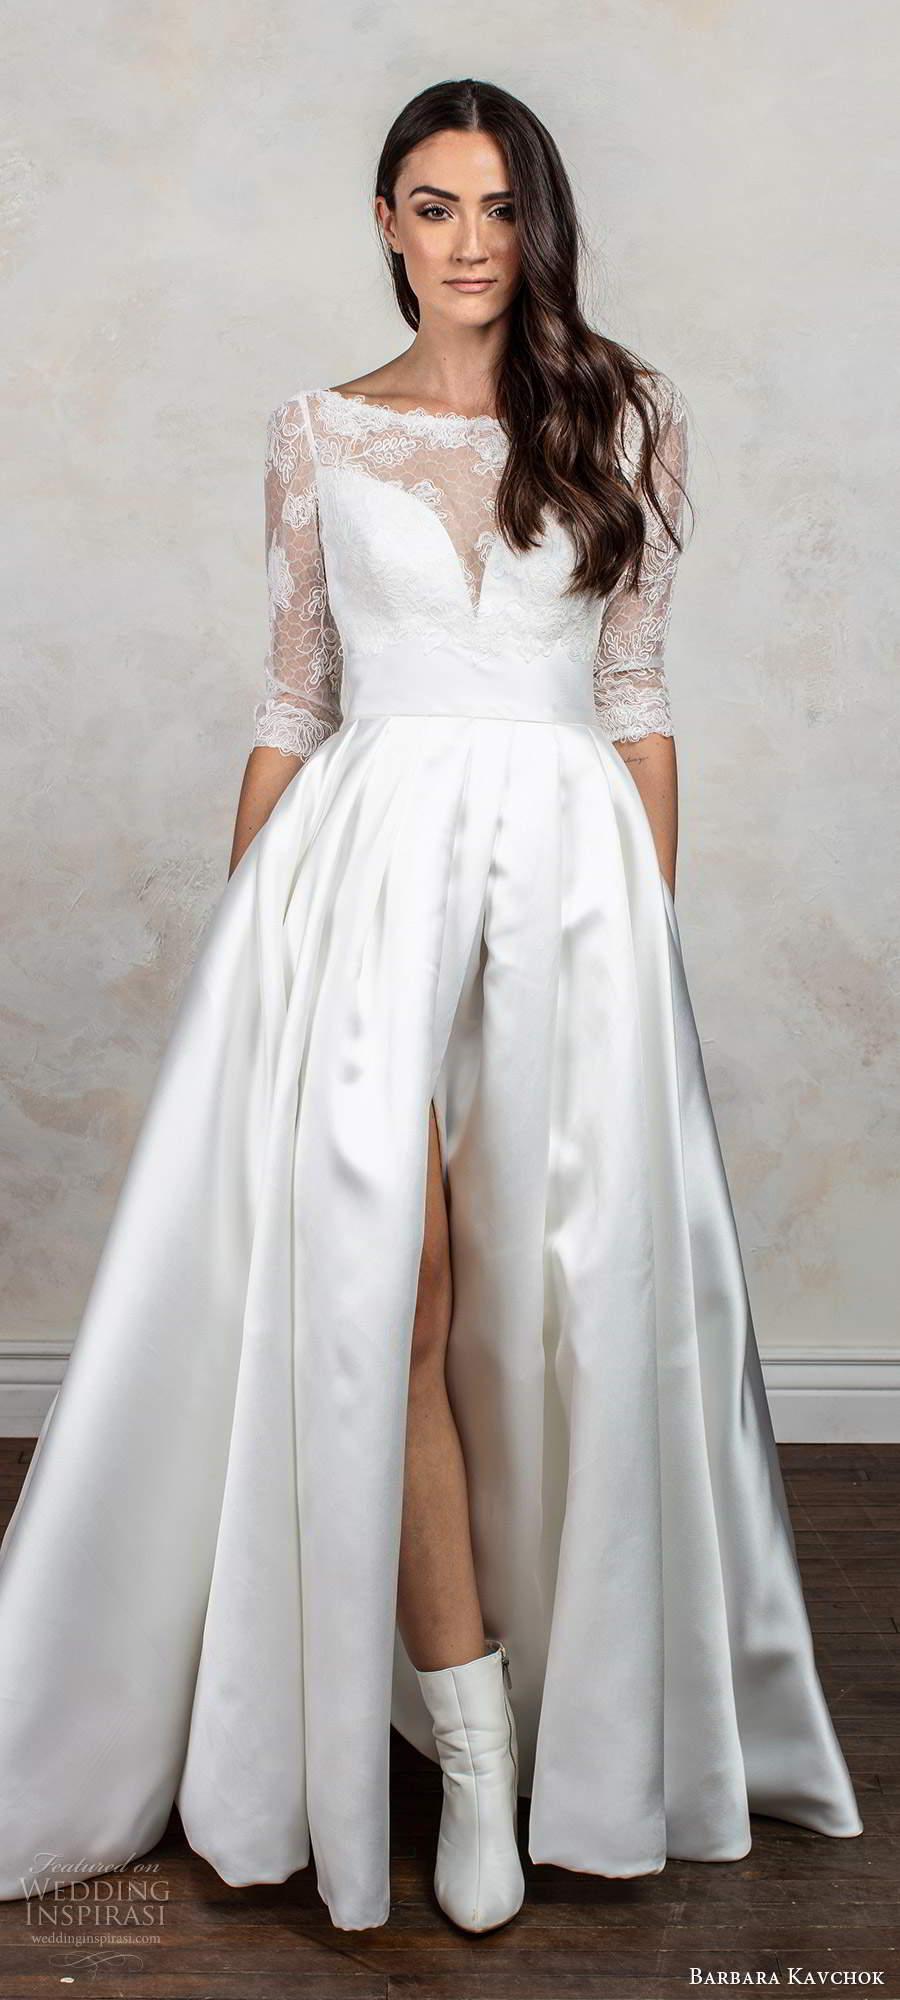 barbara kavchok fall 2020 bridal illusion 3 quarter sleeves bateau neck sweetheart neckline clean slit skirt a line ball gown wedding dress chapel train (11) mv